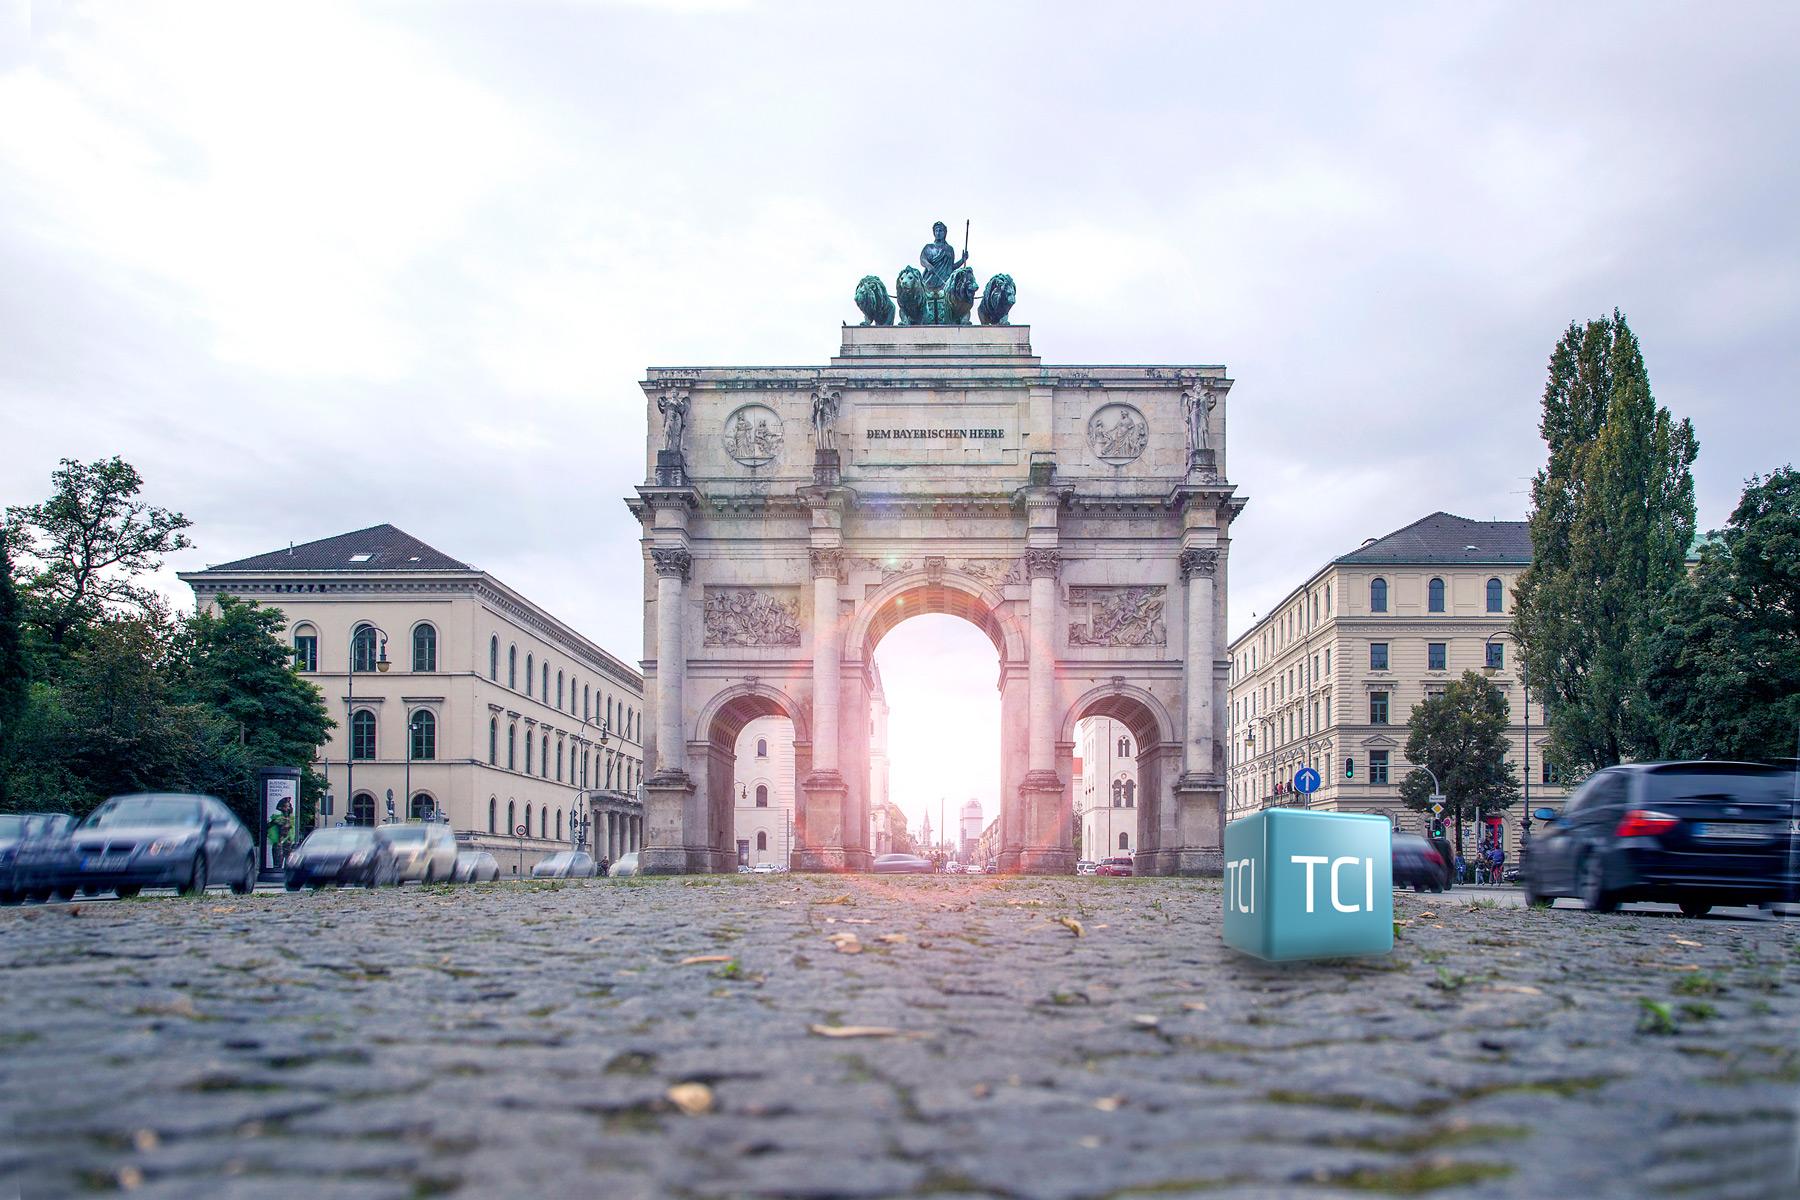 TCI Rechtsanwälte München